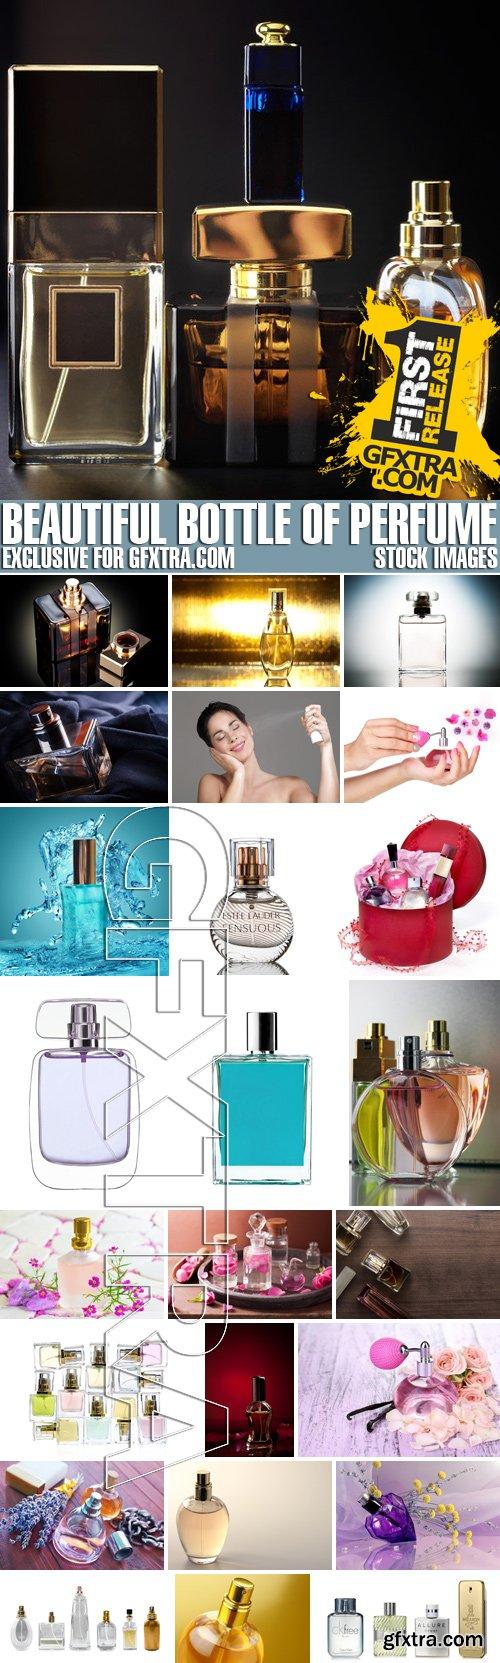 Stock Photos - Beautiful bottle of perfume